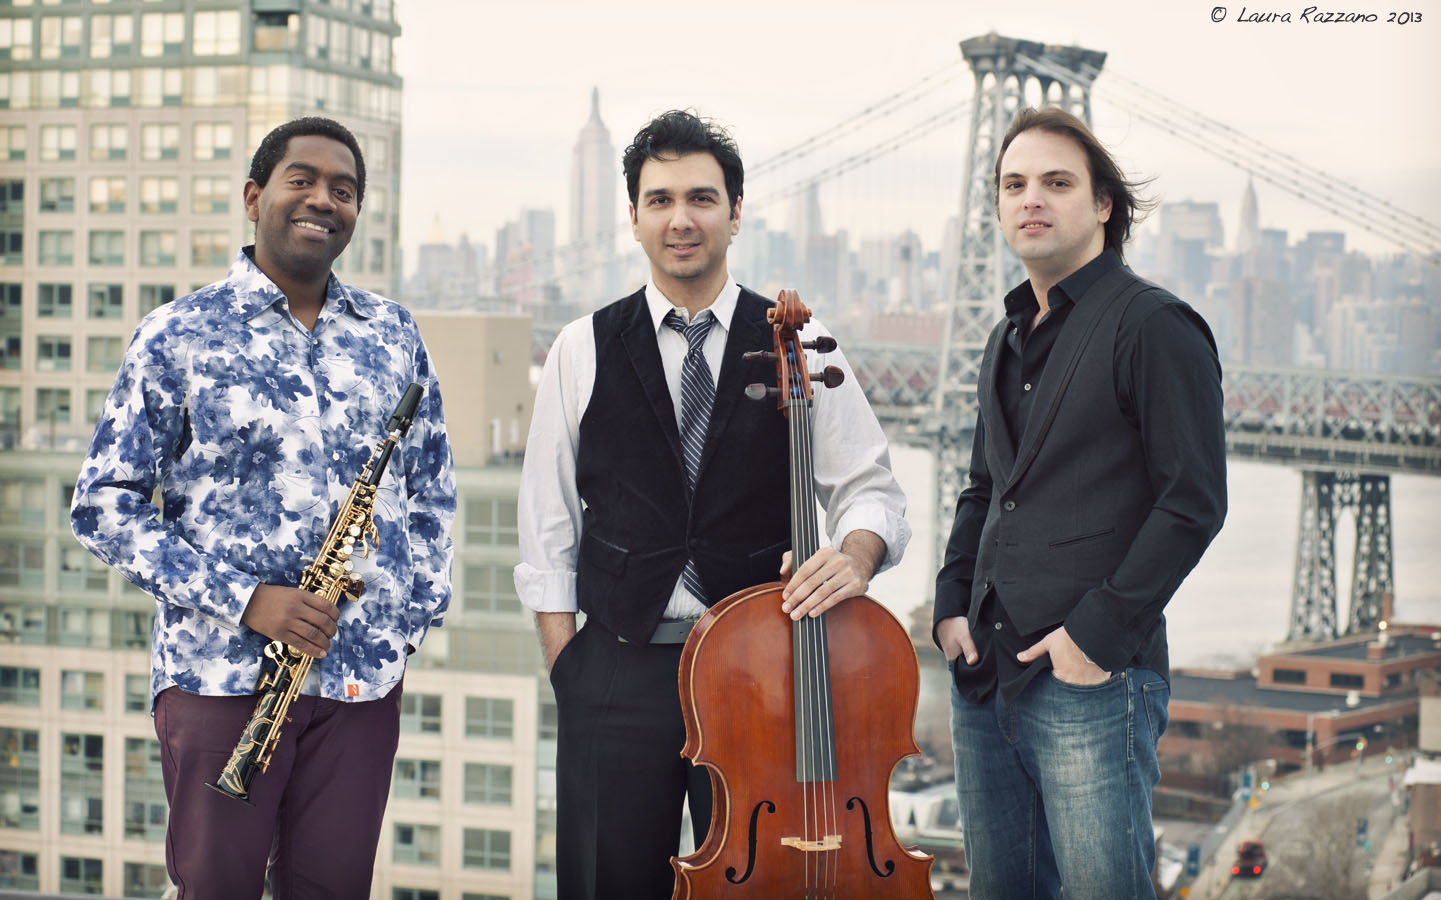 Bohemian_Trio_03_web.jpg